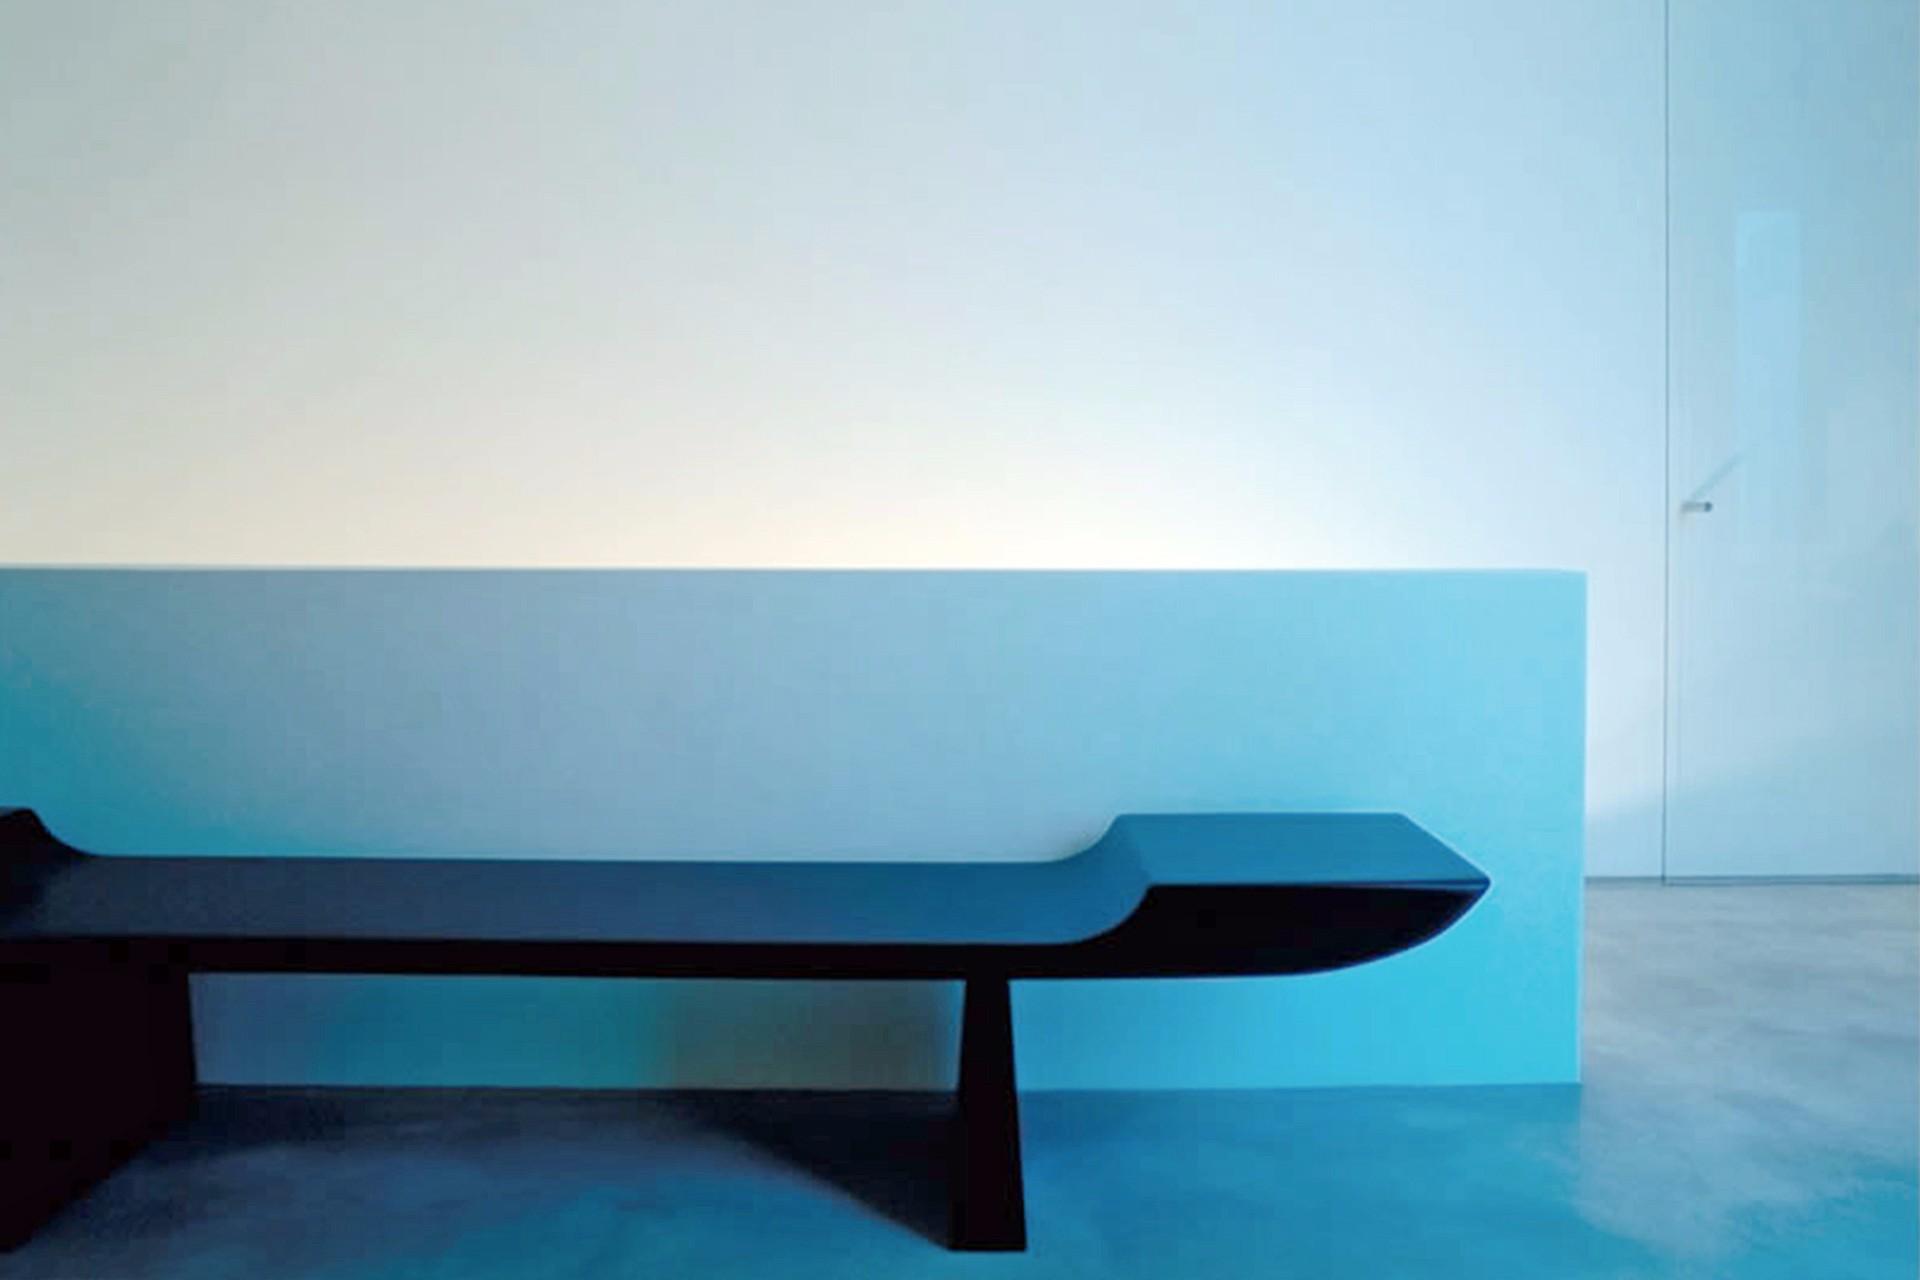 Bank Massivholz Design Sara Spiro